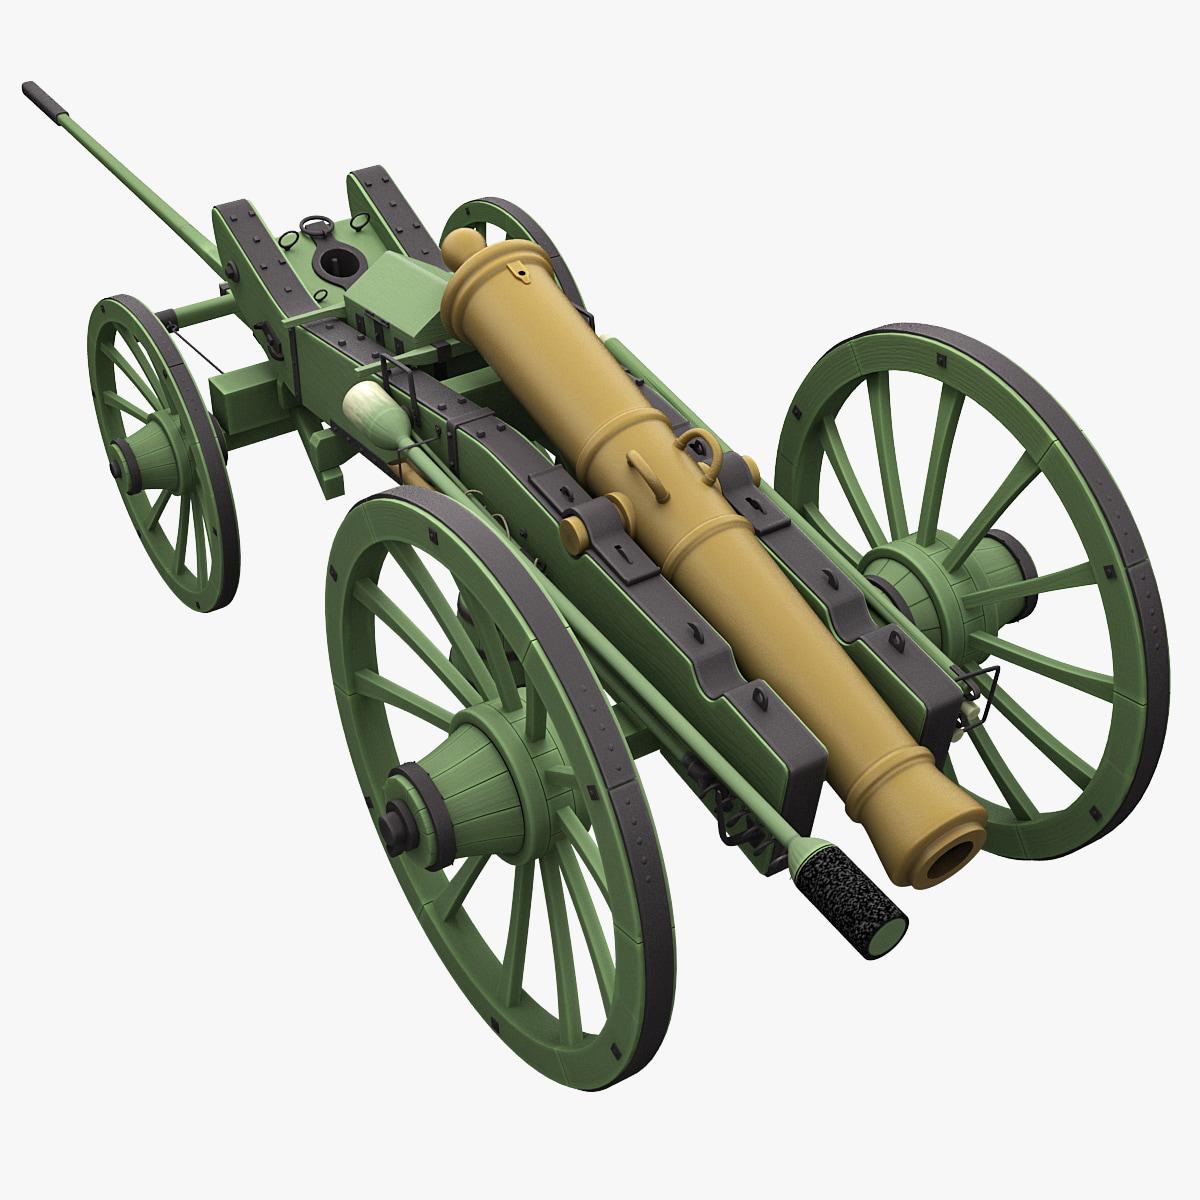 Napoleons_12-pdr_Gribeau_Field_Gun_Transport_Position_0002.jpg